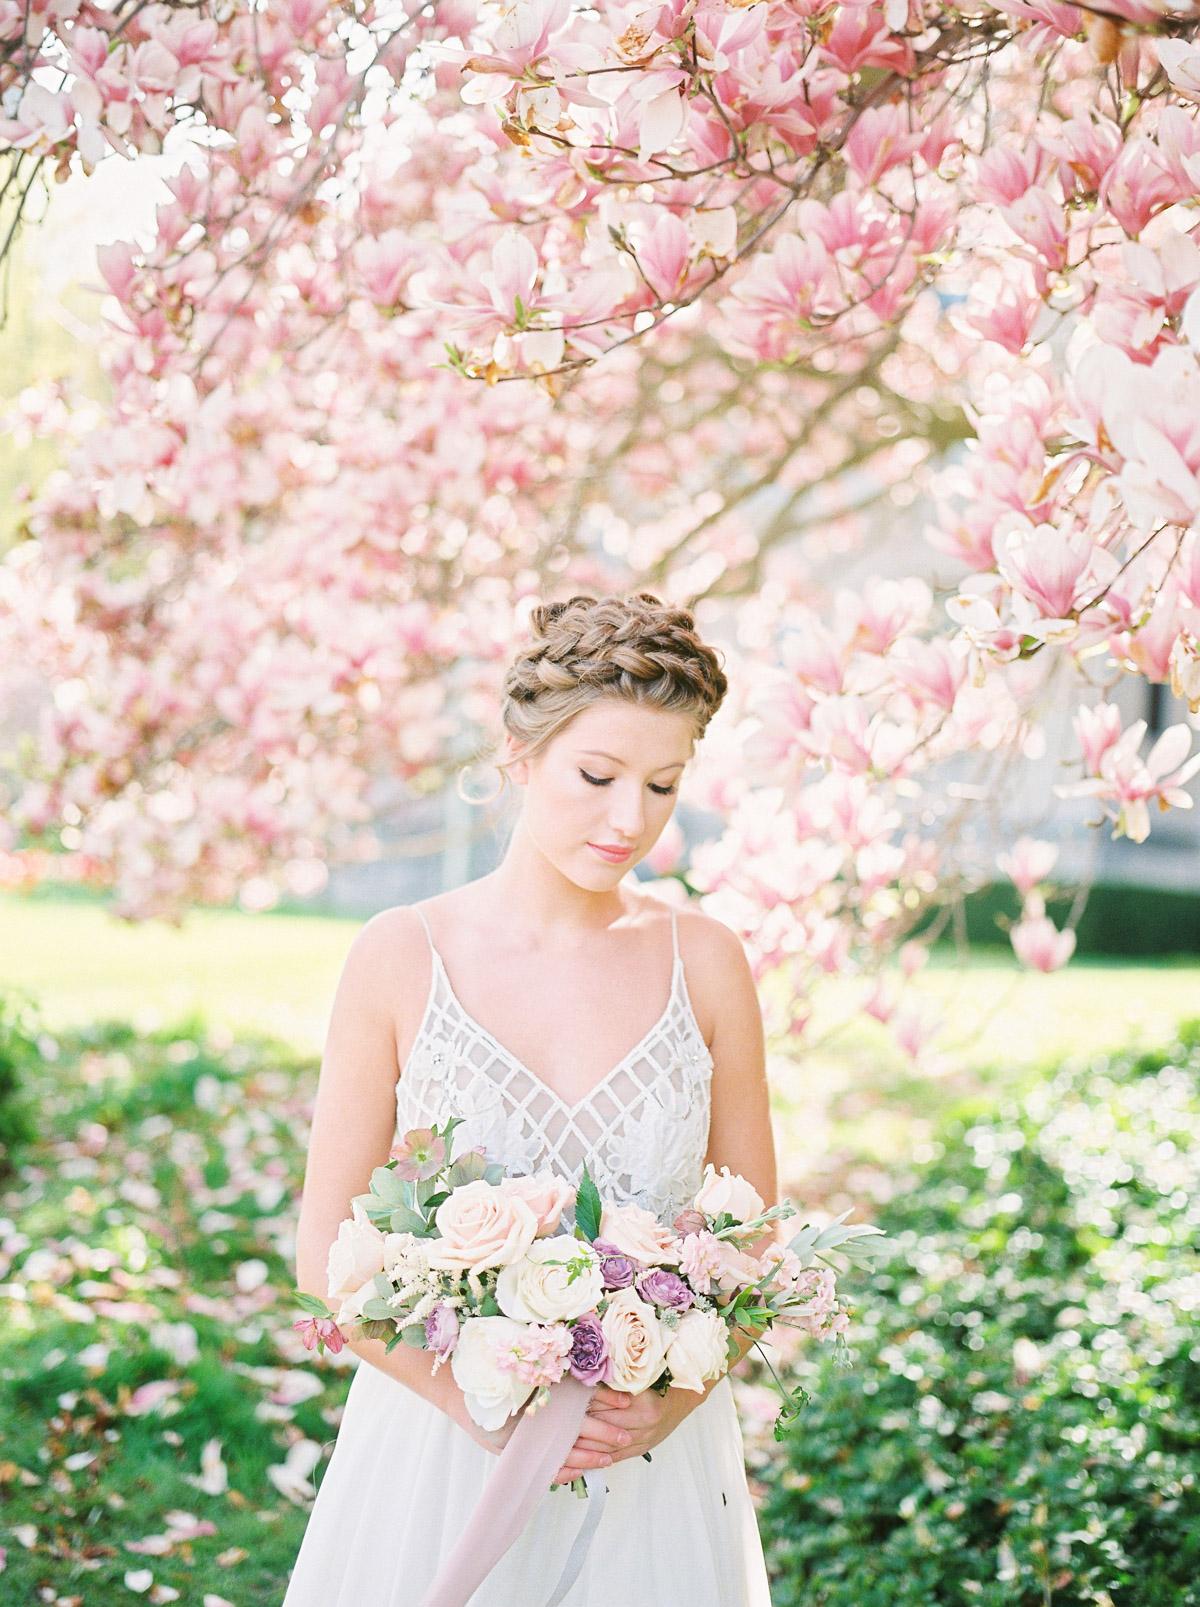 julia-park-photography-vineyard-bride-swish-list-niagara-on-the-lake-wedding-editorial-19.jpg